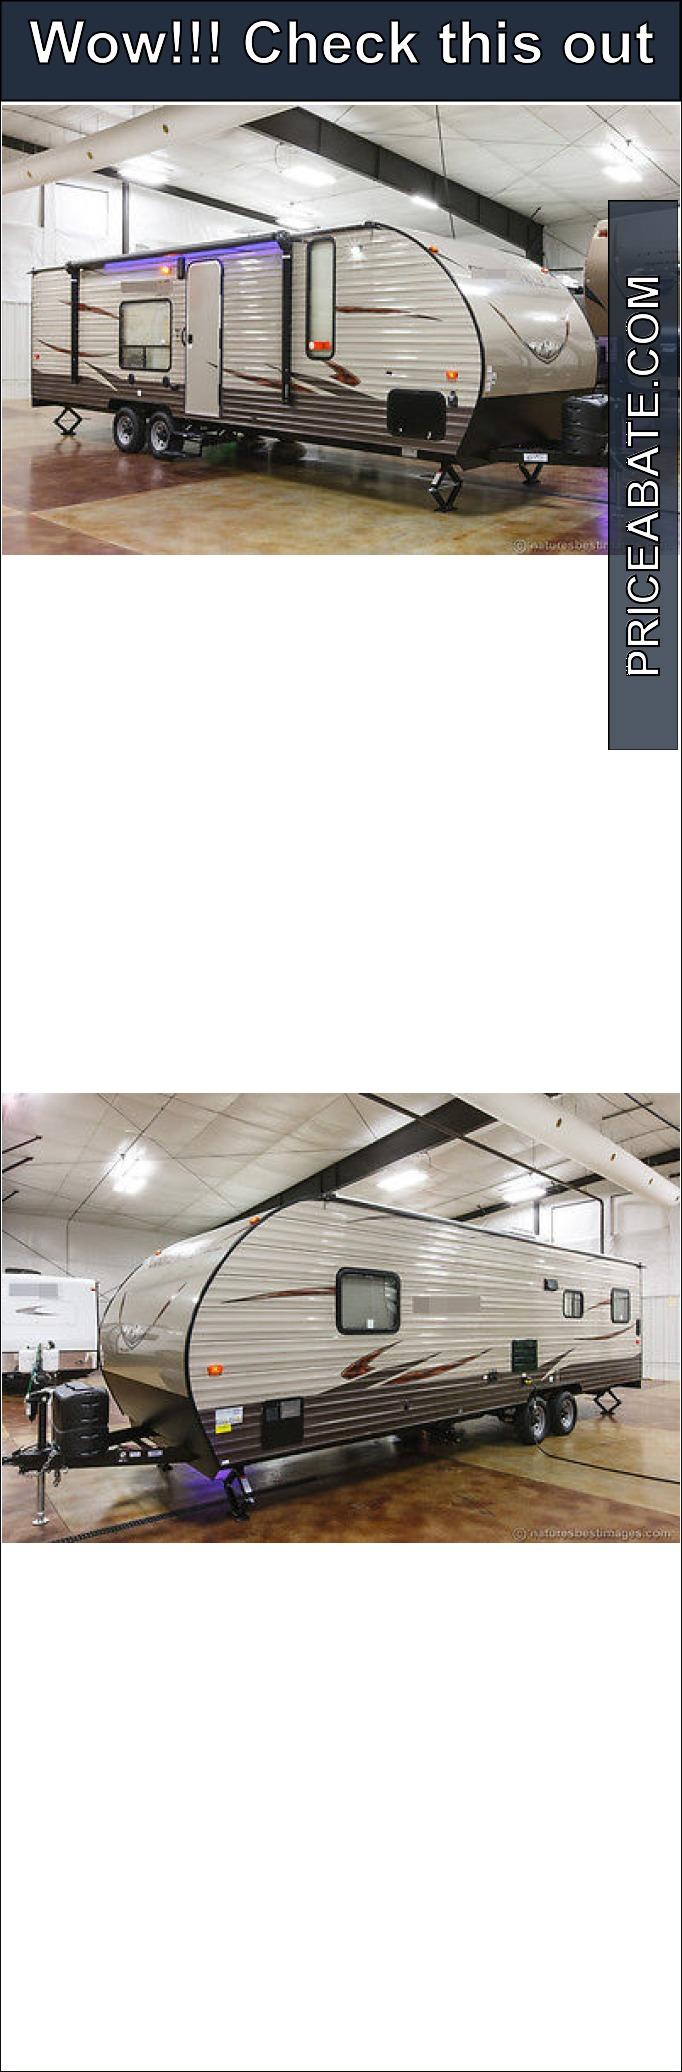 rvs: New 2016 26RR Limited Lite Lightweight Toy Hauler Travel Trailer Camper For Sale #RVS - New 2016 26RR Limited Lite Lightweight Toy Hauler Travel Trailer Camper For Sale...